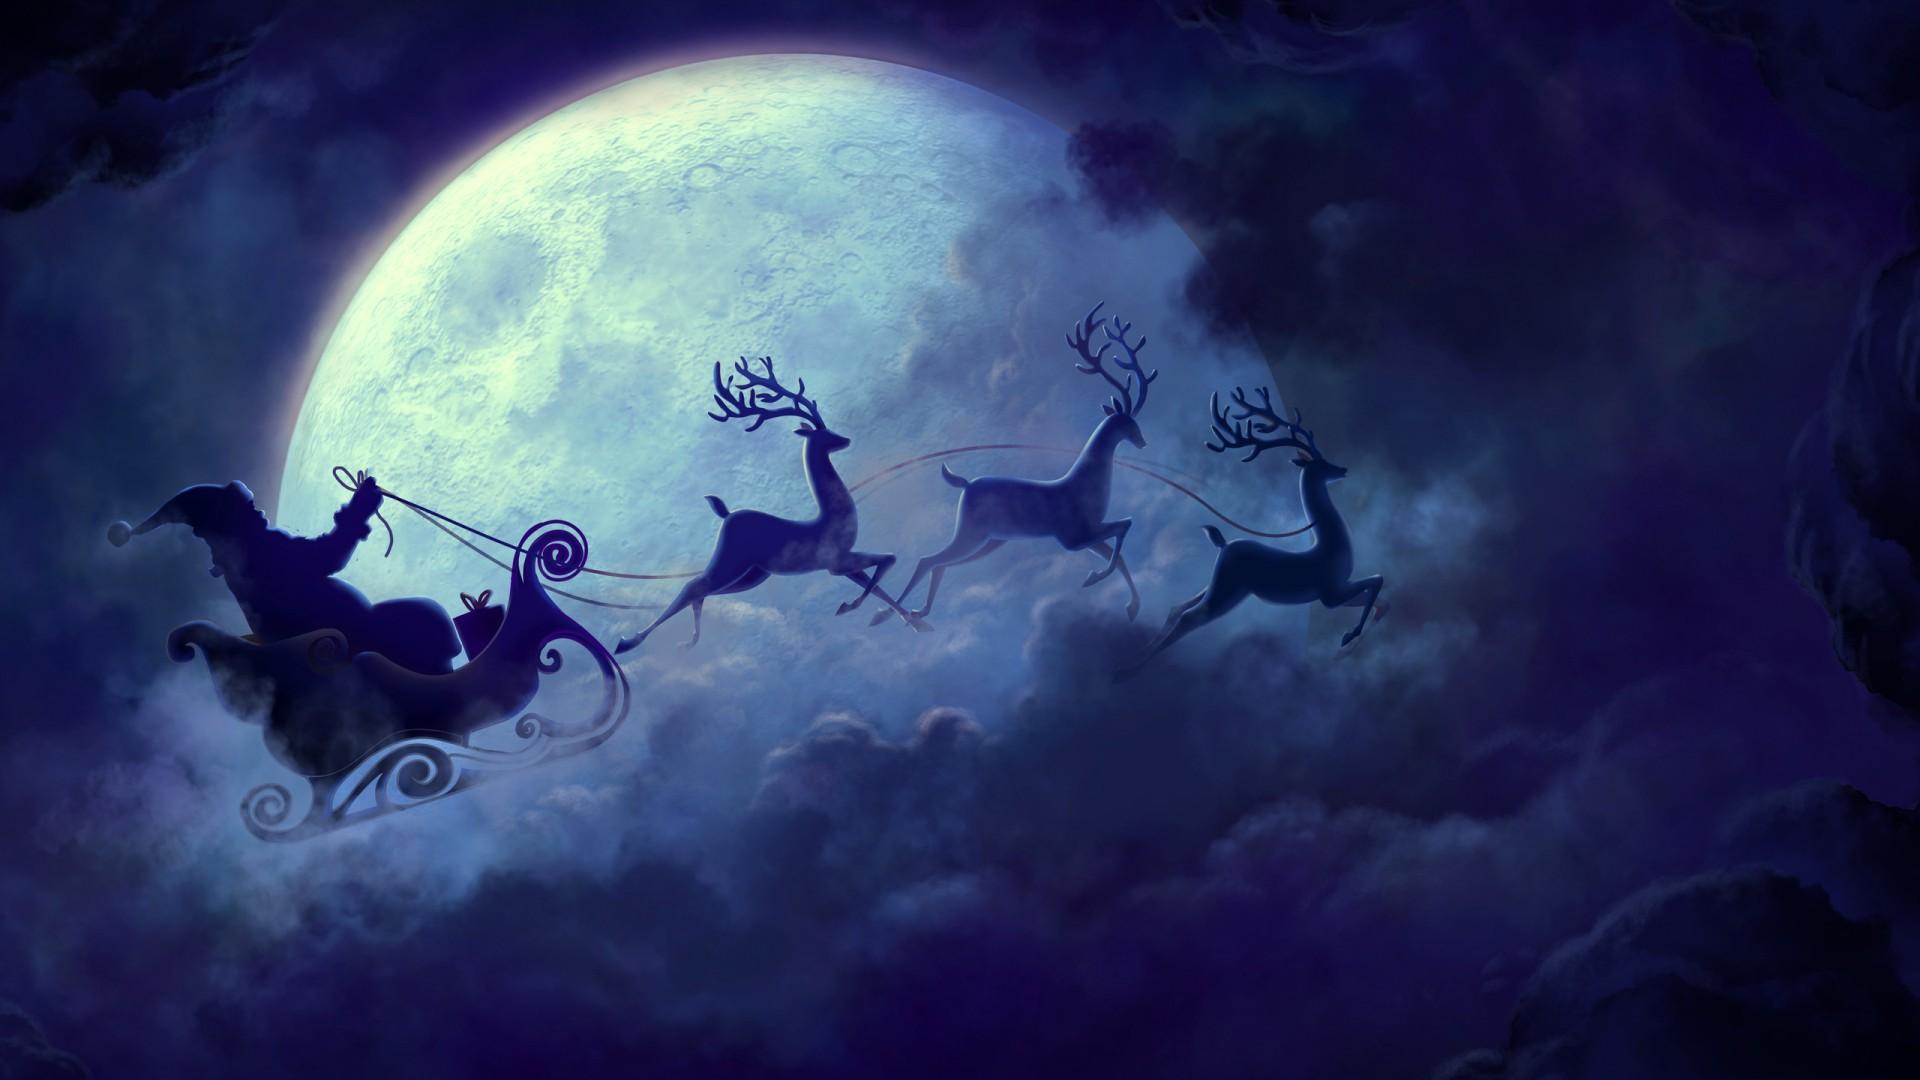 Anime Merry Christmas Wallpaper Santa Claus Moon Wallpapers Hd Wallpapers